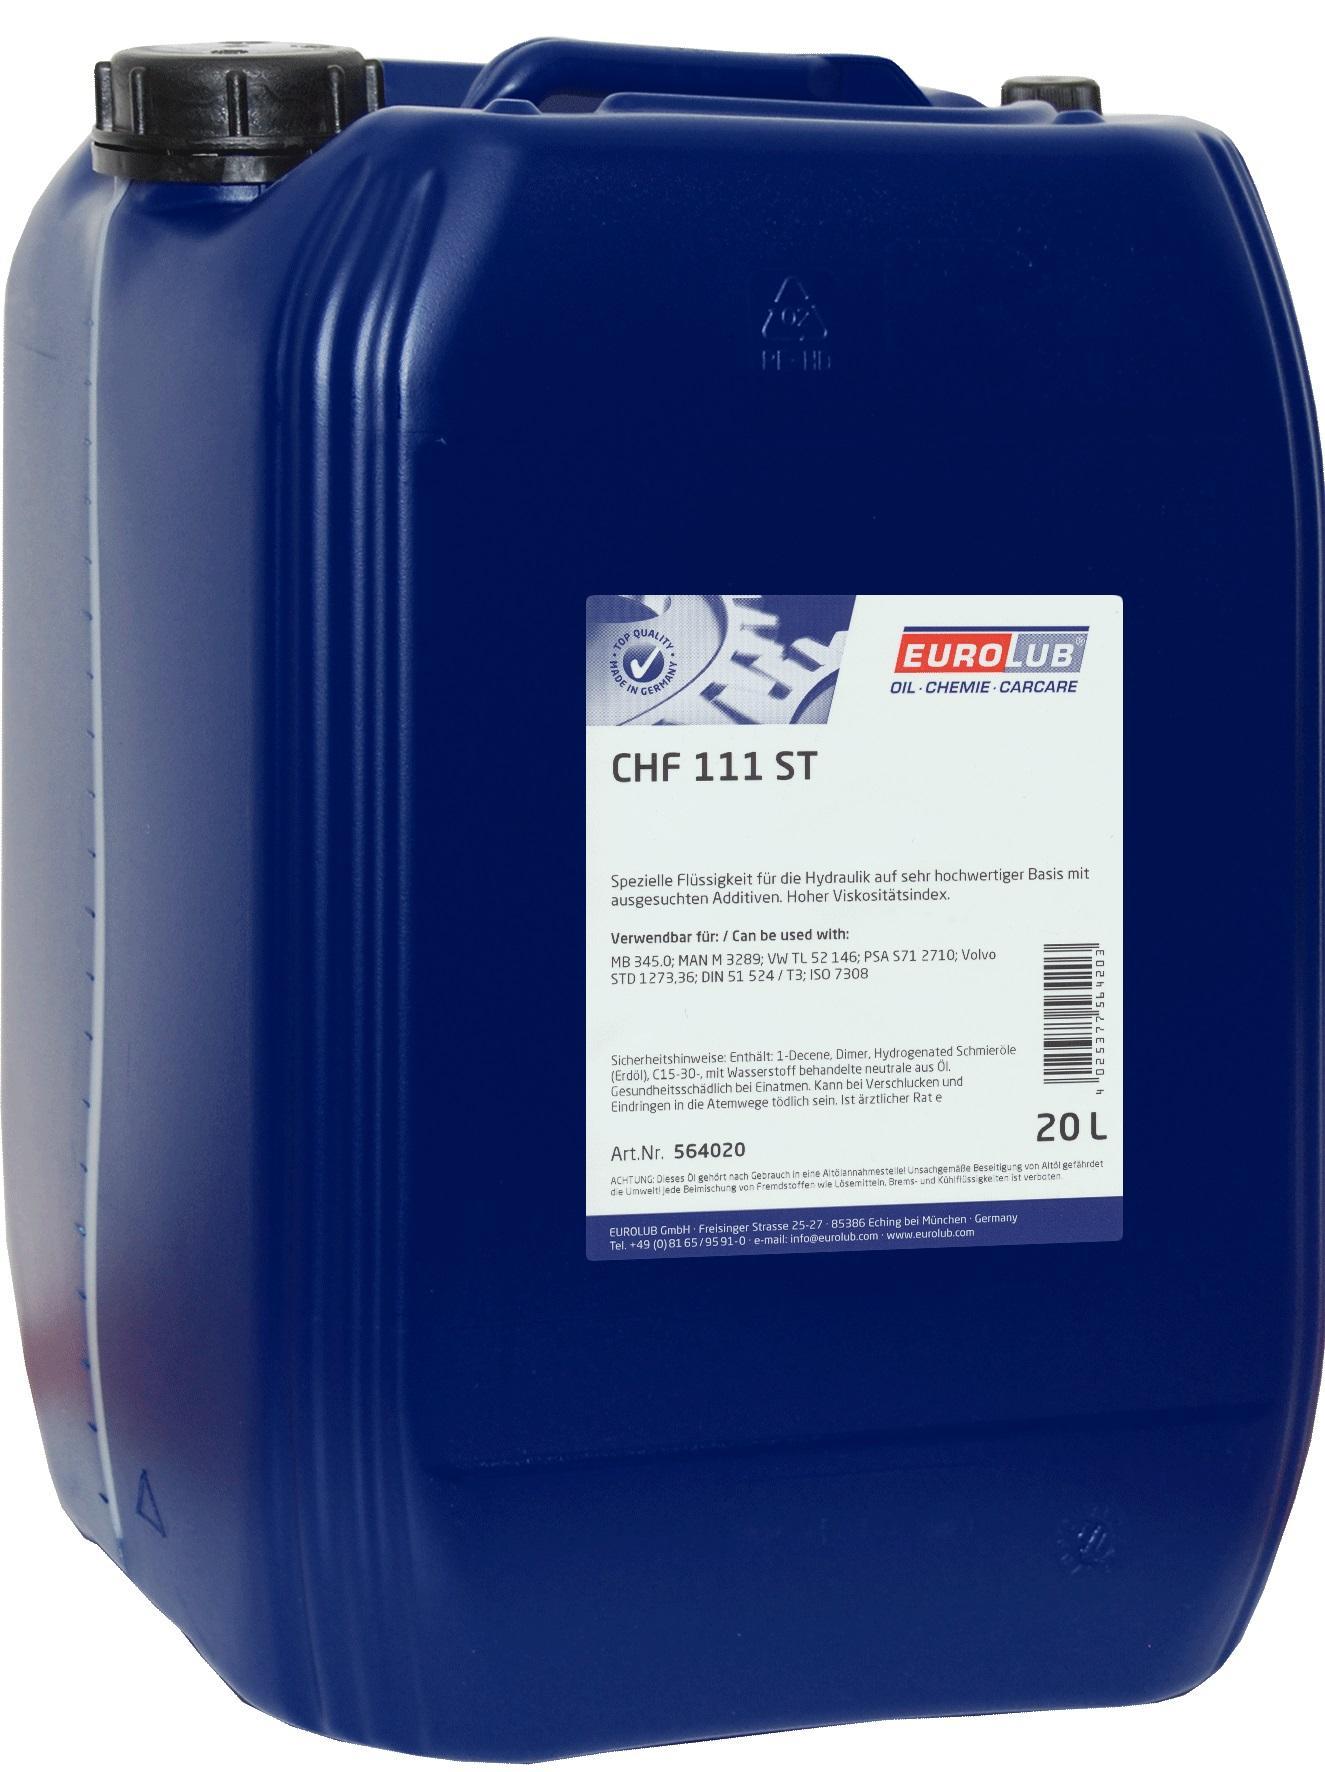 EUROLUB: Original Zentralhydrauliköl 564020 ()